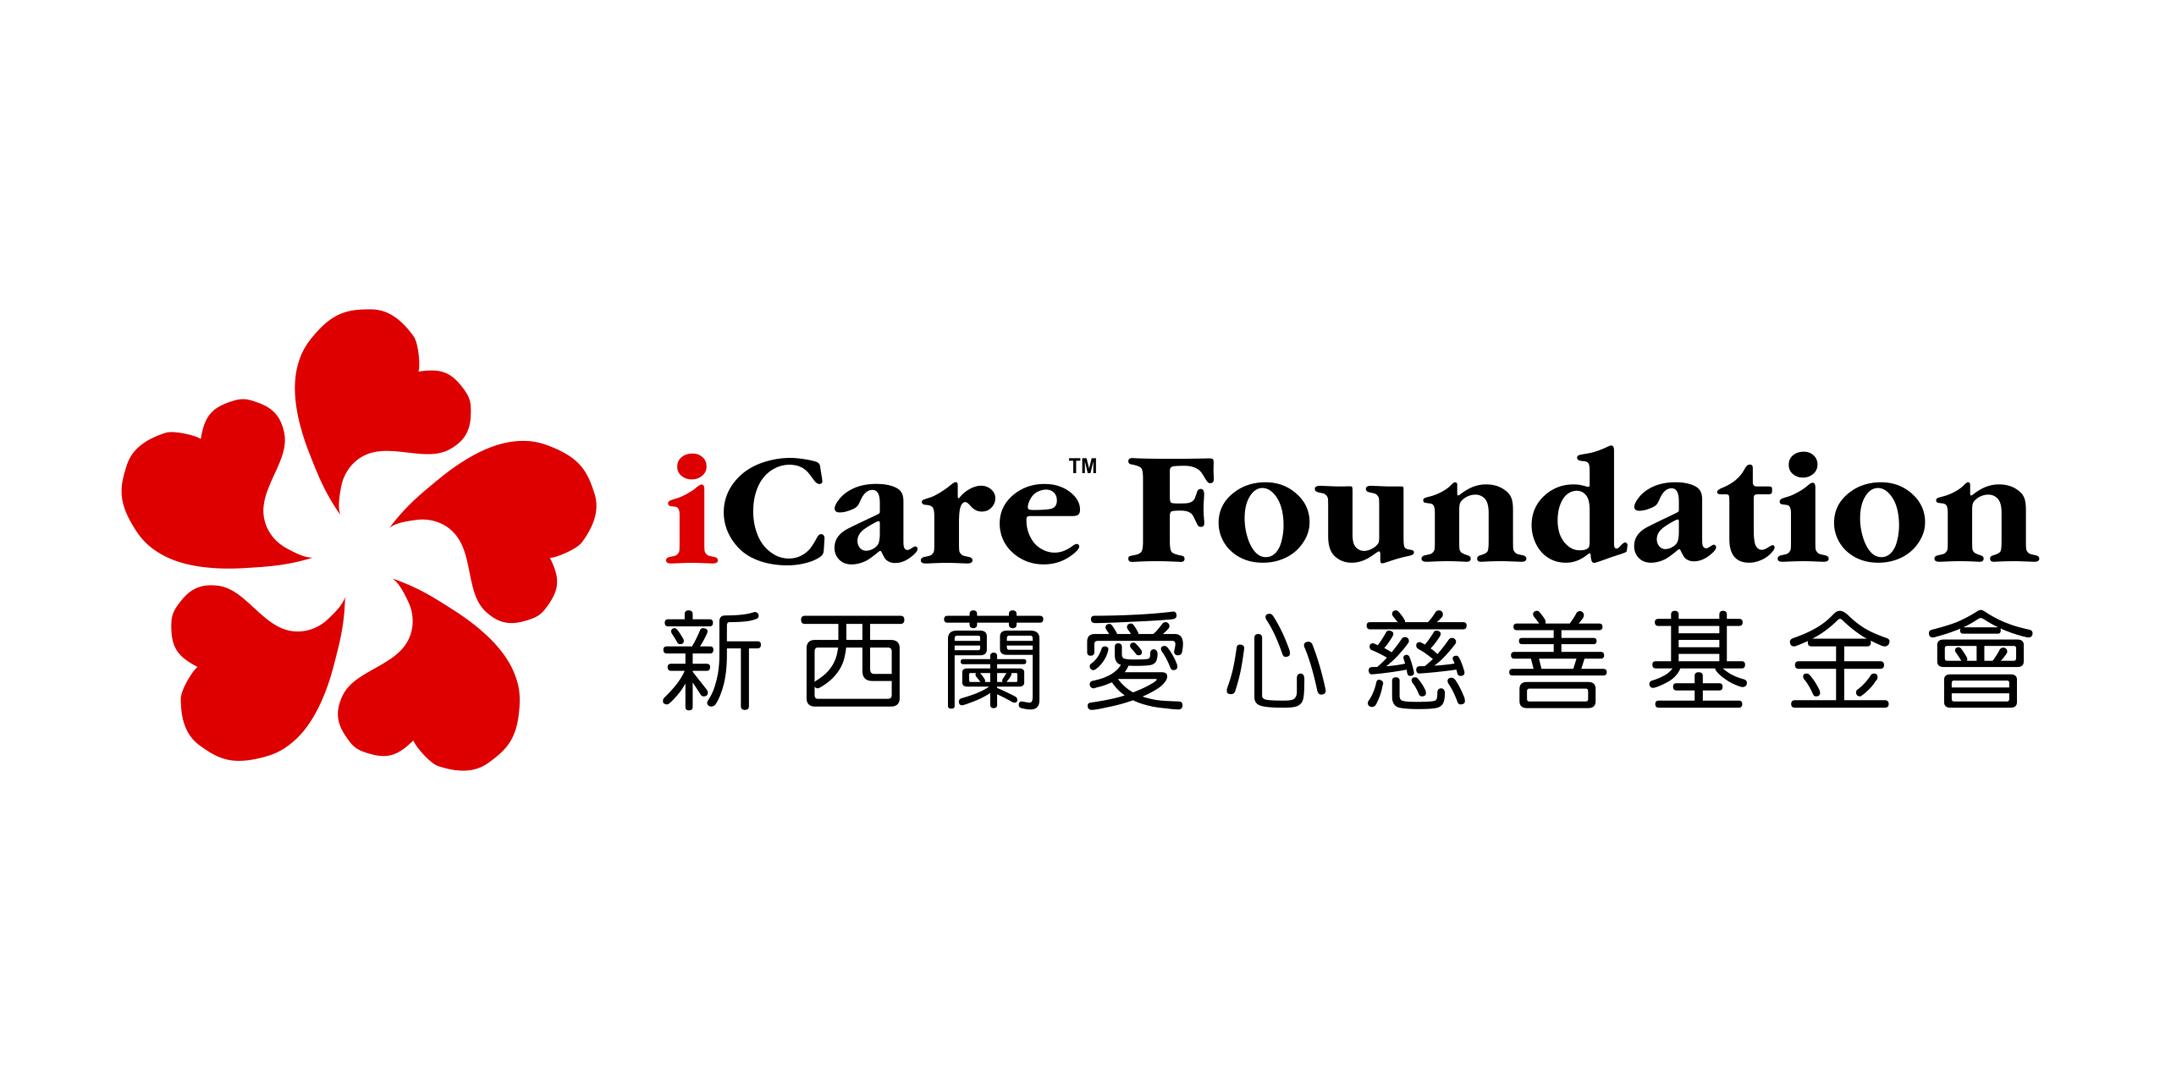 iCare Foundation Logo